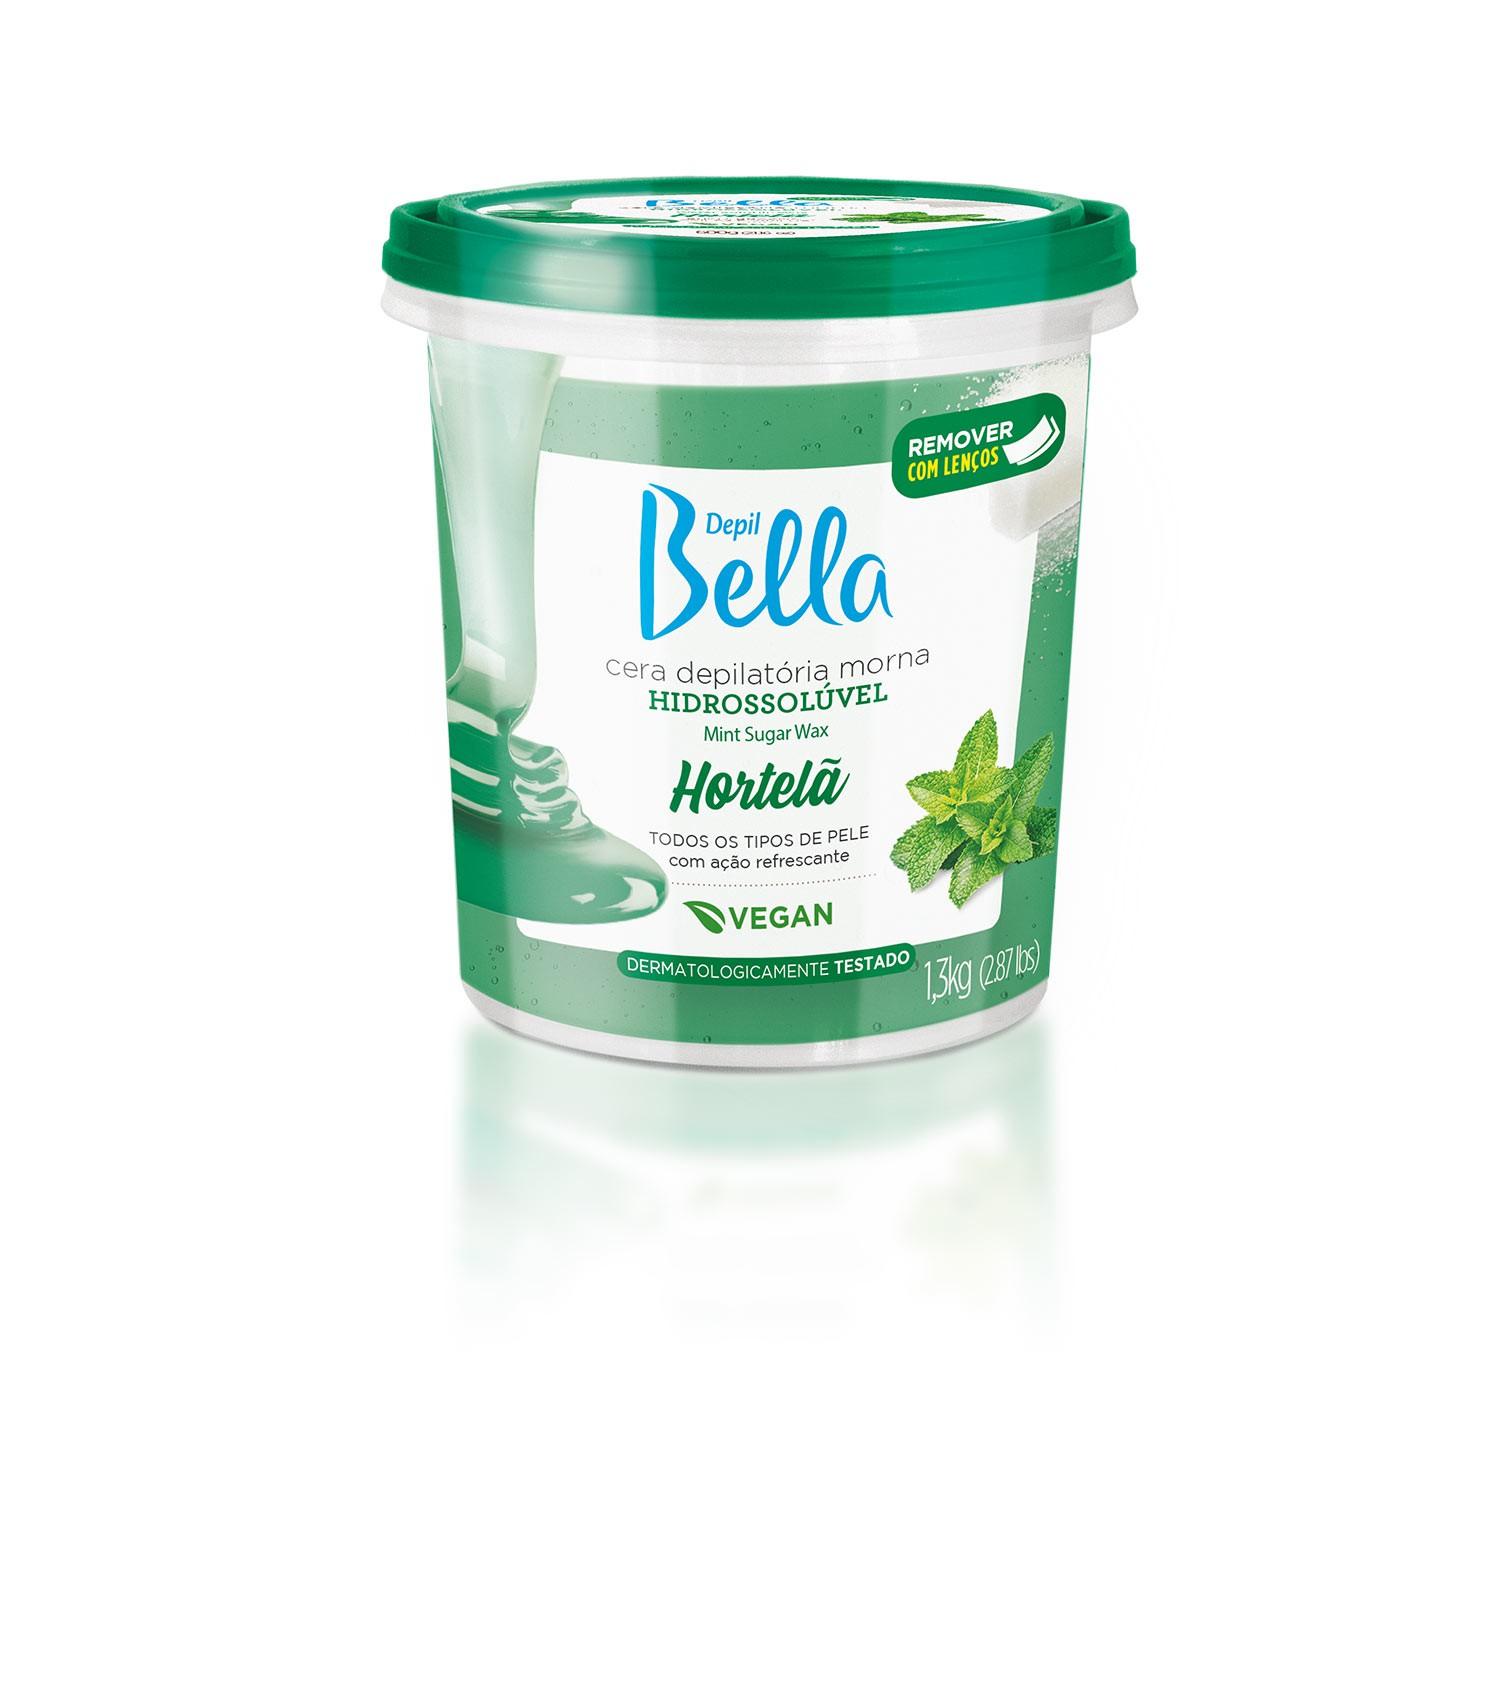 Cera Hidrossolúvel Natural Depil Bella Hortelã Morna 1300 g